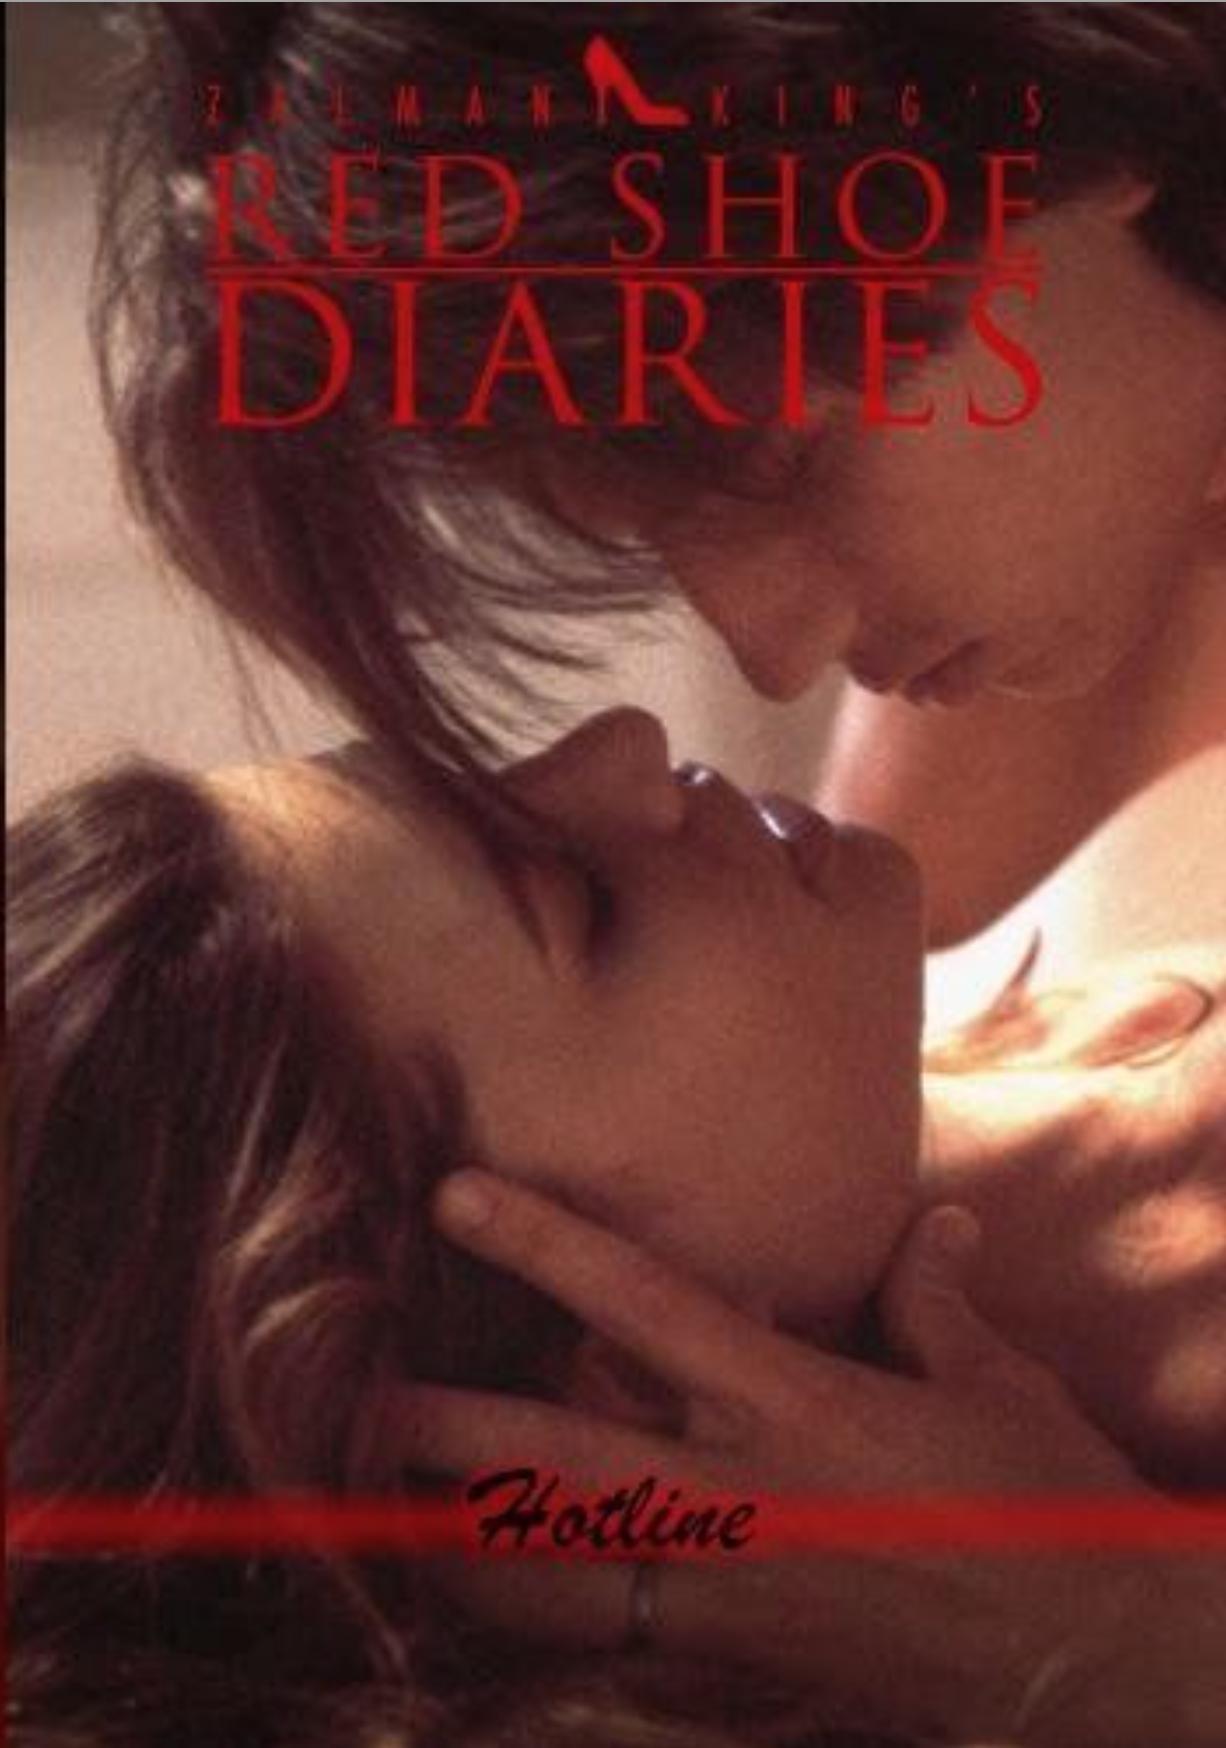 Red Shoe Diaries Hotline Tv Episode 1993 Imdb